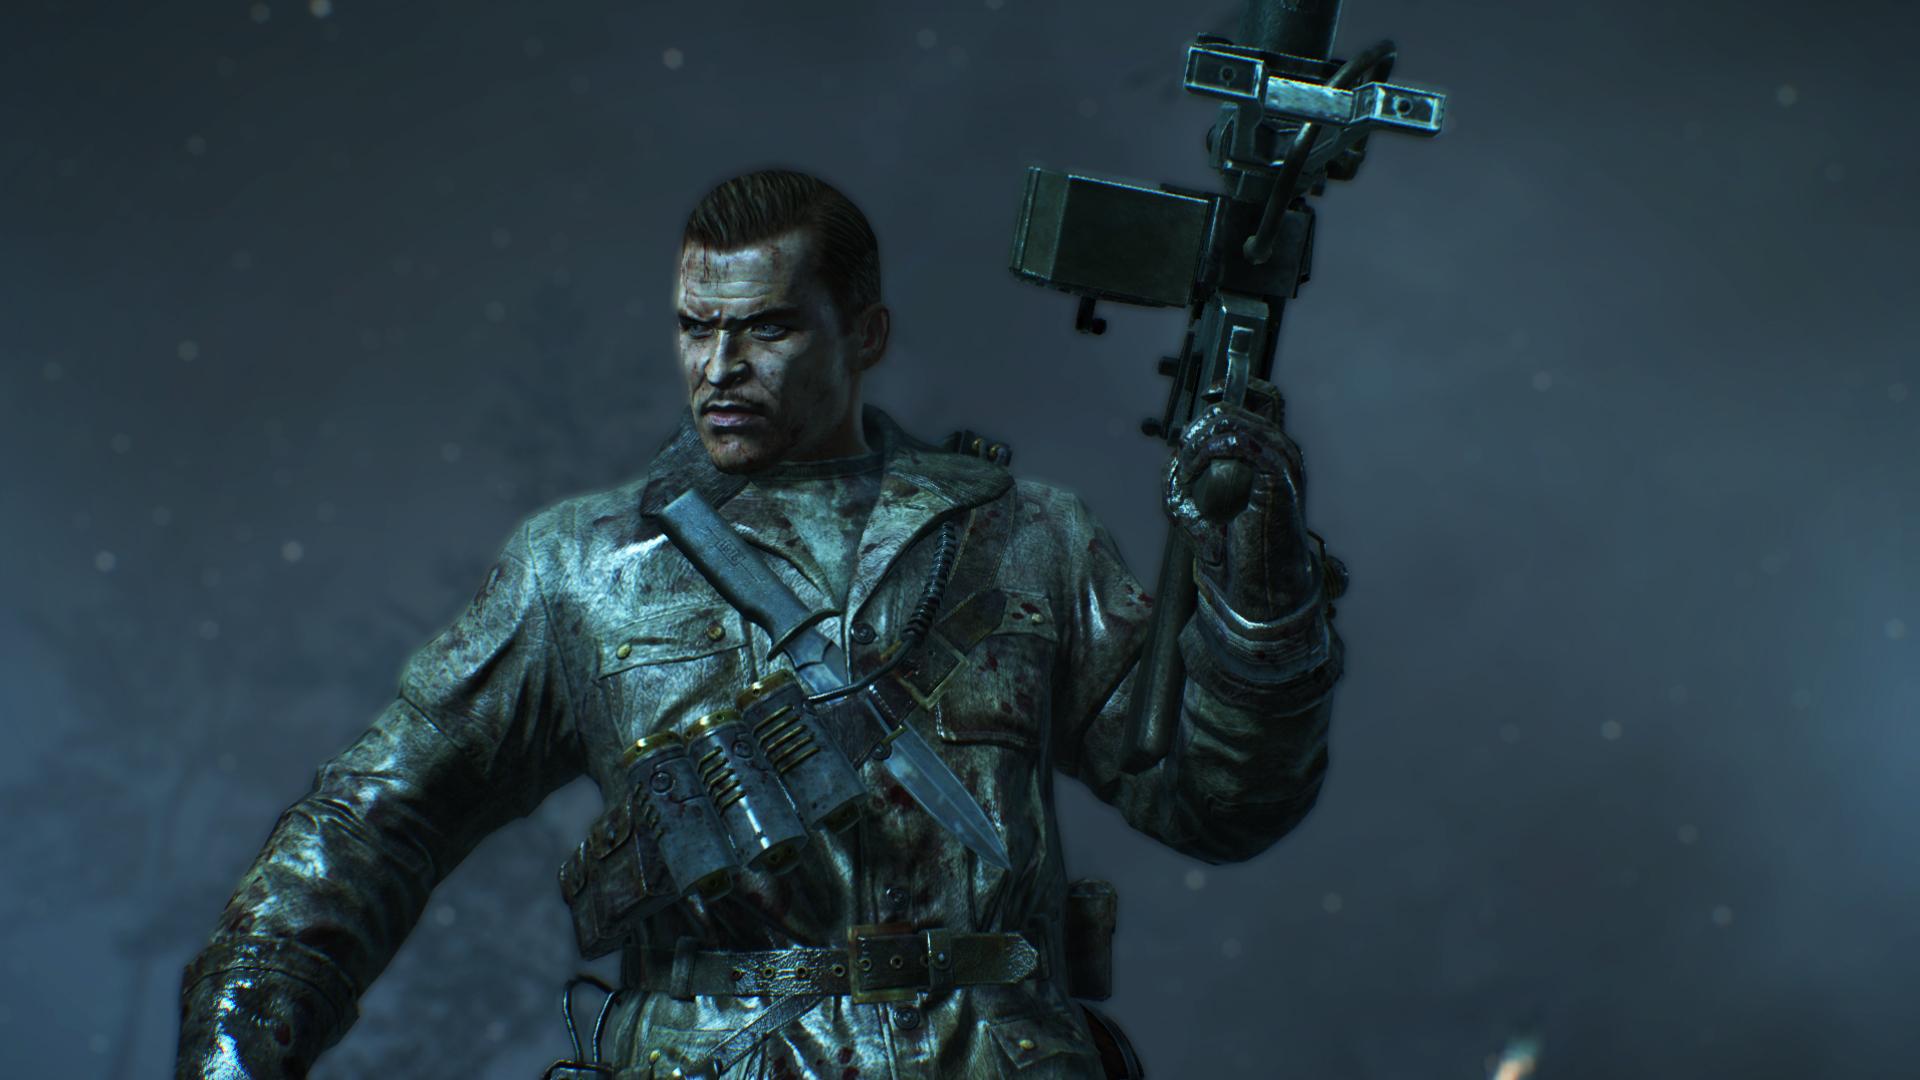 Showcase :: Call of Duty: Black Ops II - Zombies